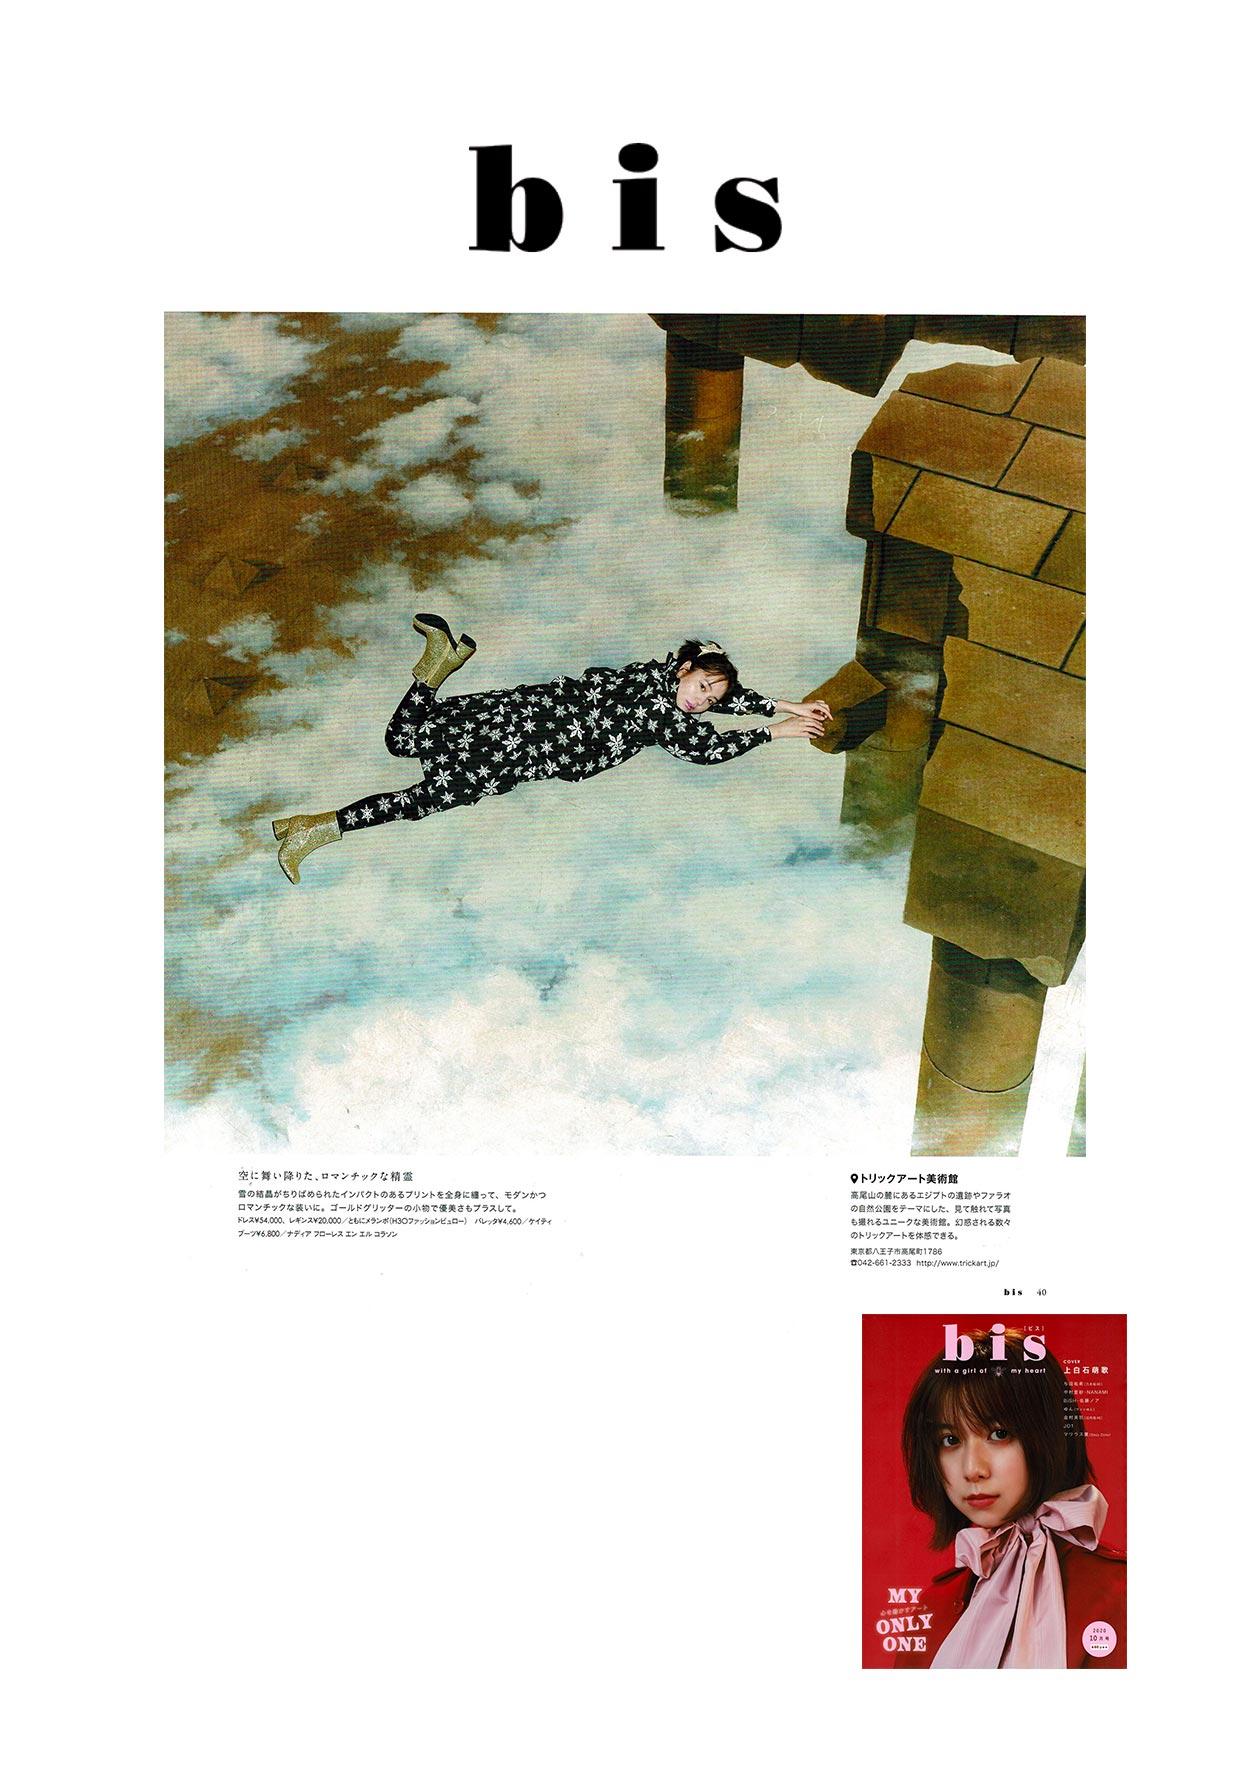 melampo press on bis magazine Japan - photo 2